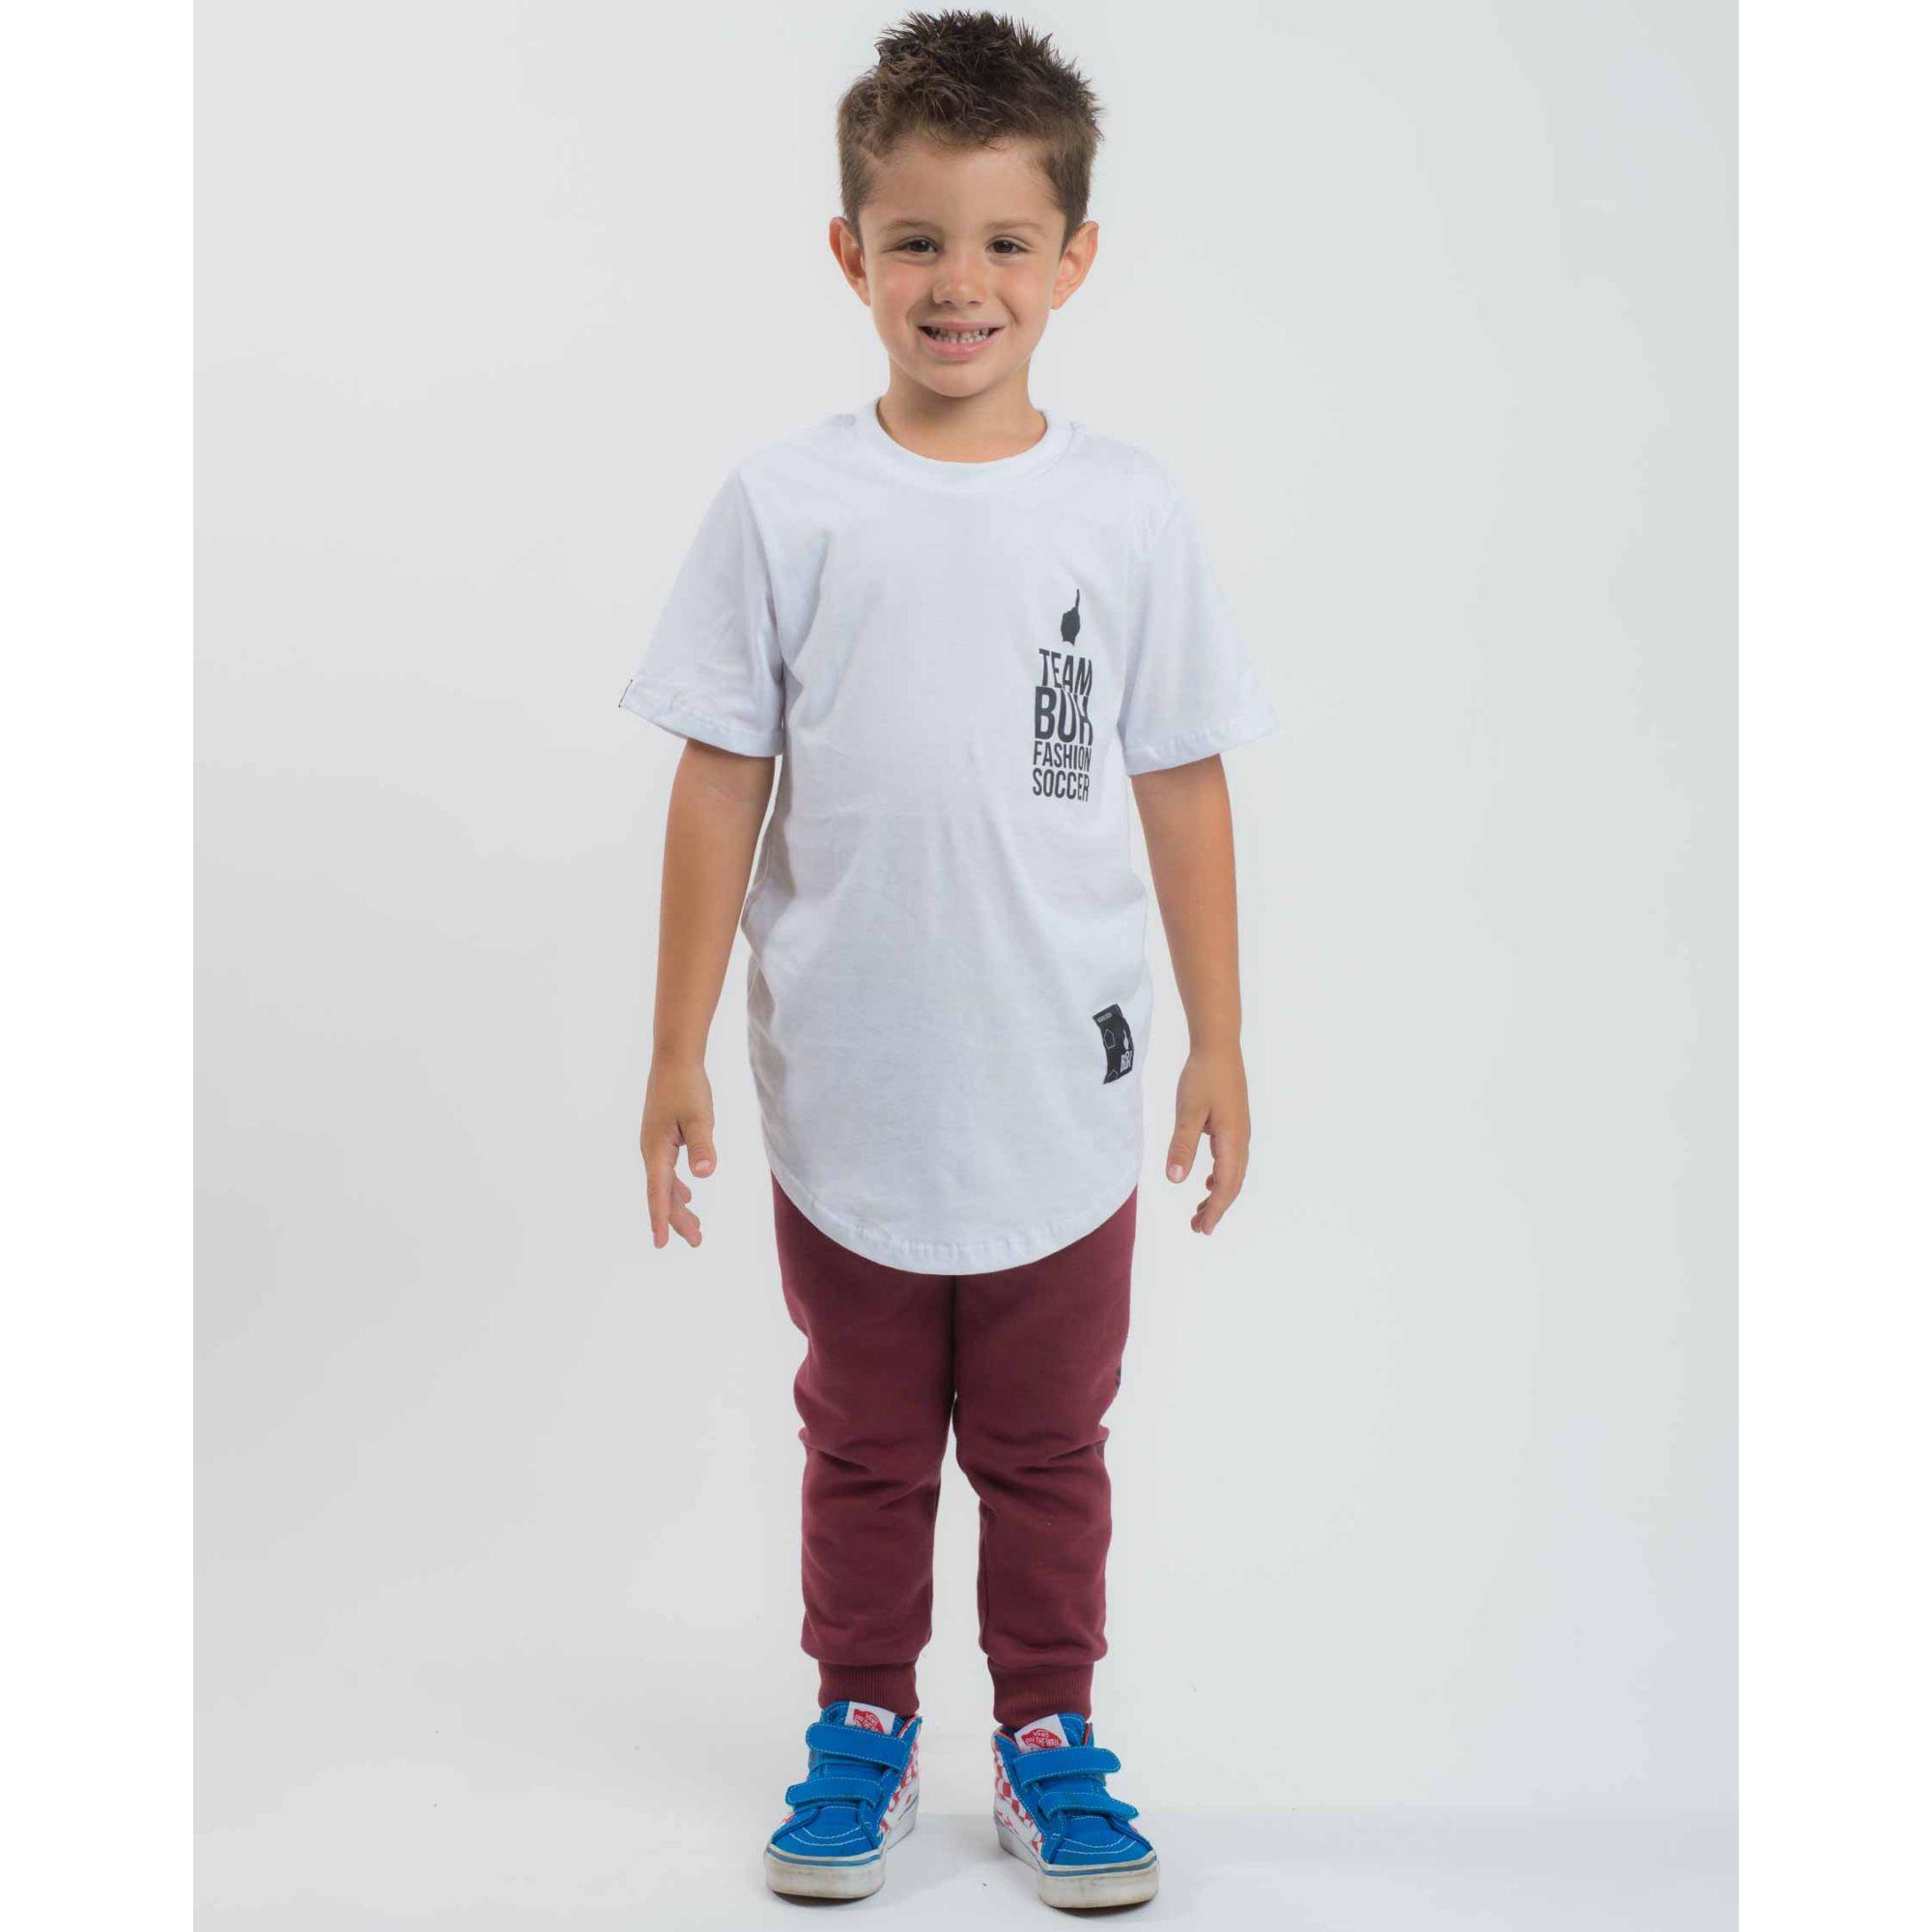 Camiseta Buh Kids Team White & Black